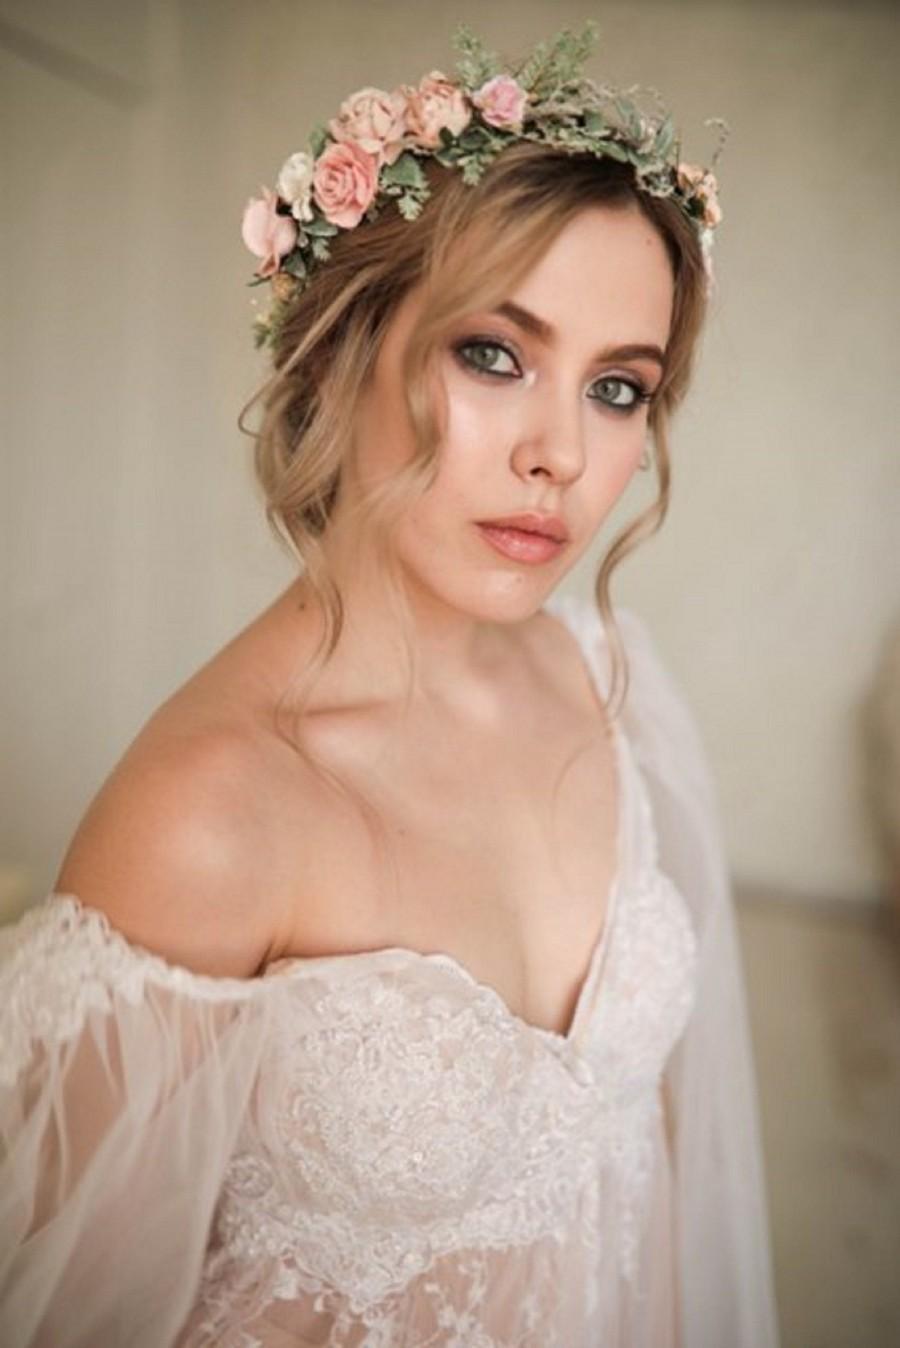 زفاف - Blush flower crown Wedding flower crown Blush floral crown Bridal flower hair piece Blush Wedding crown Bridesmaid crown Flower girl crown